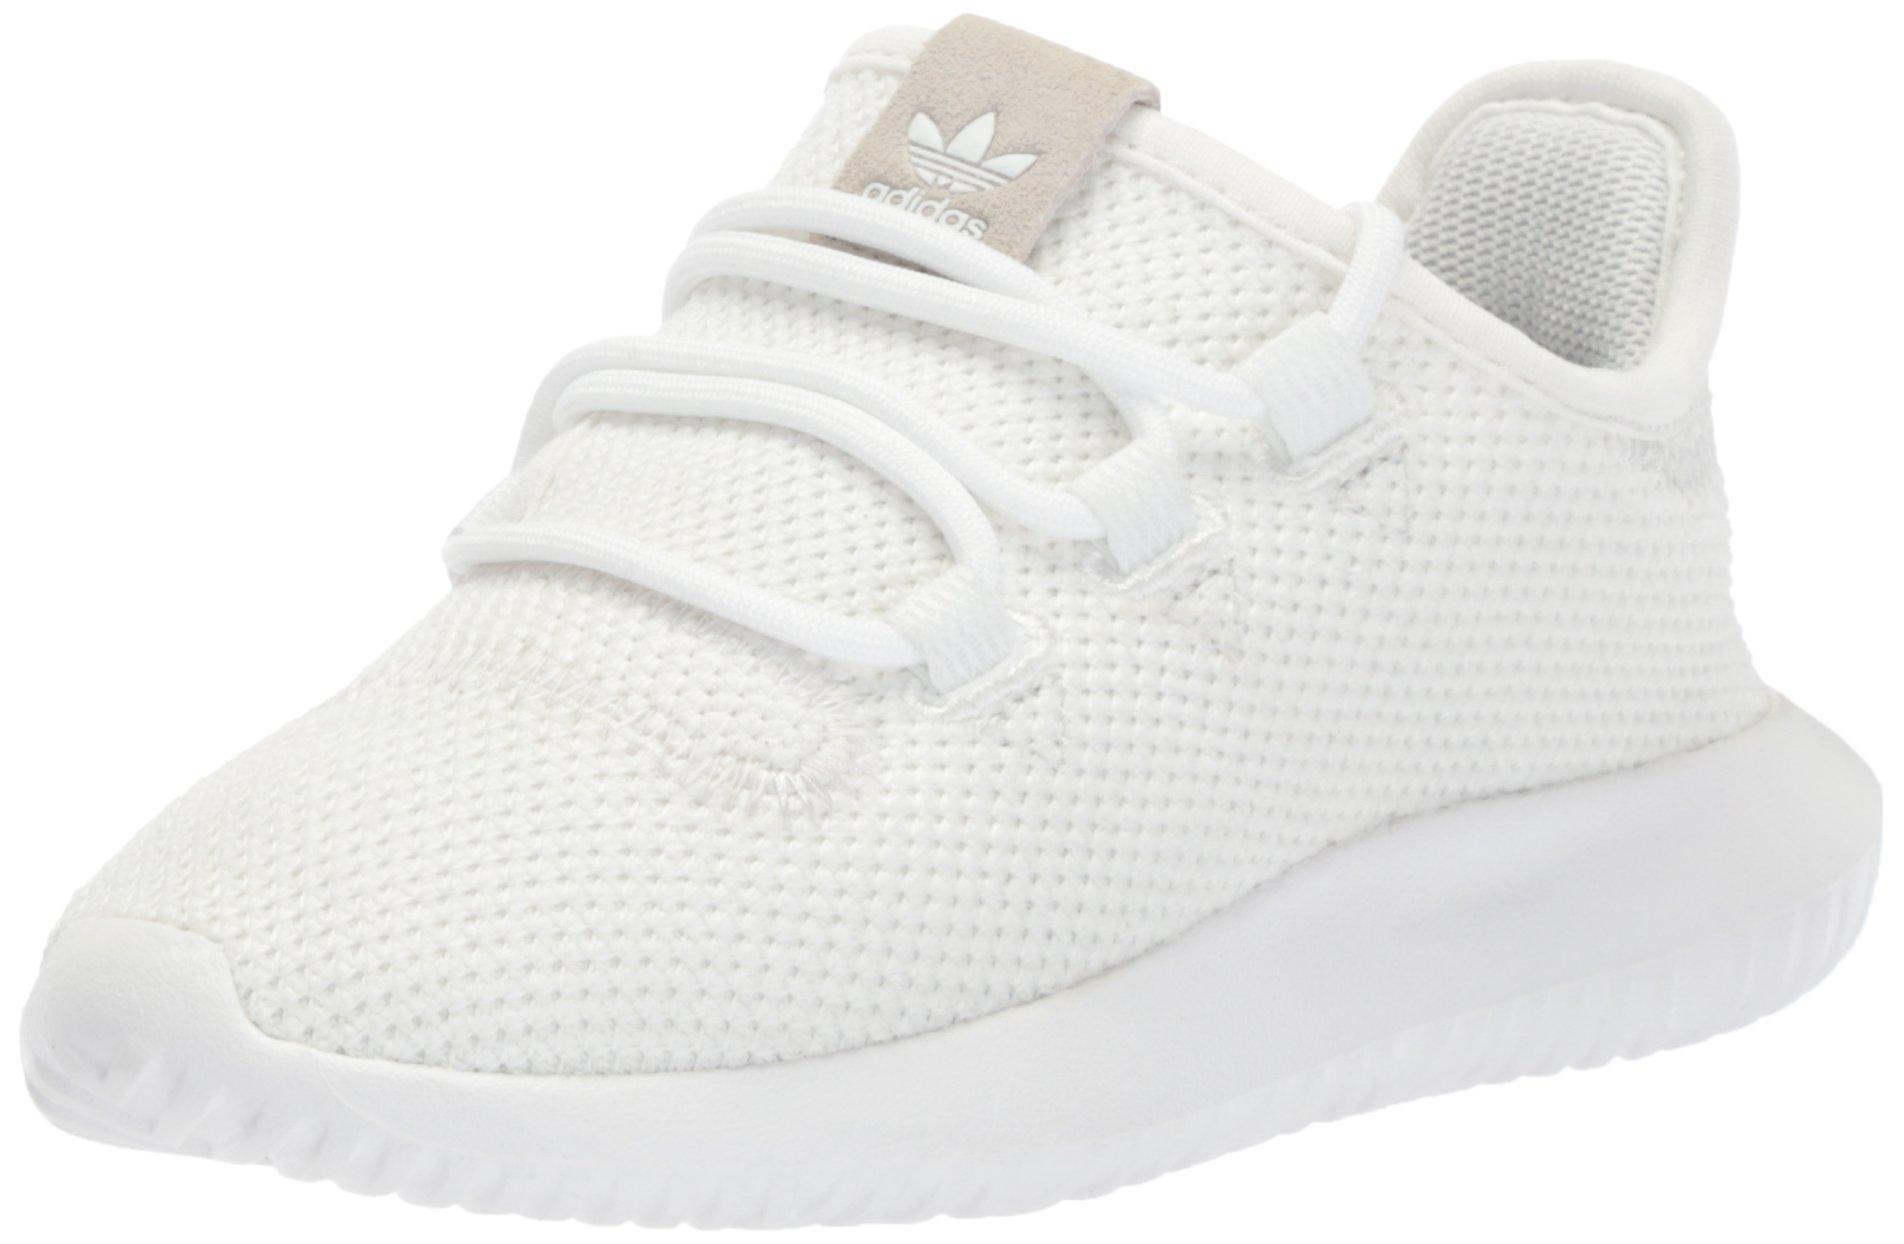 adidas Originals Kids Tubular Shadow I Running Shoe adidas Originals Kids/' Tubular Shadow I Running Shoe